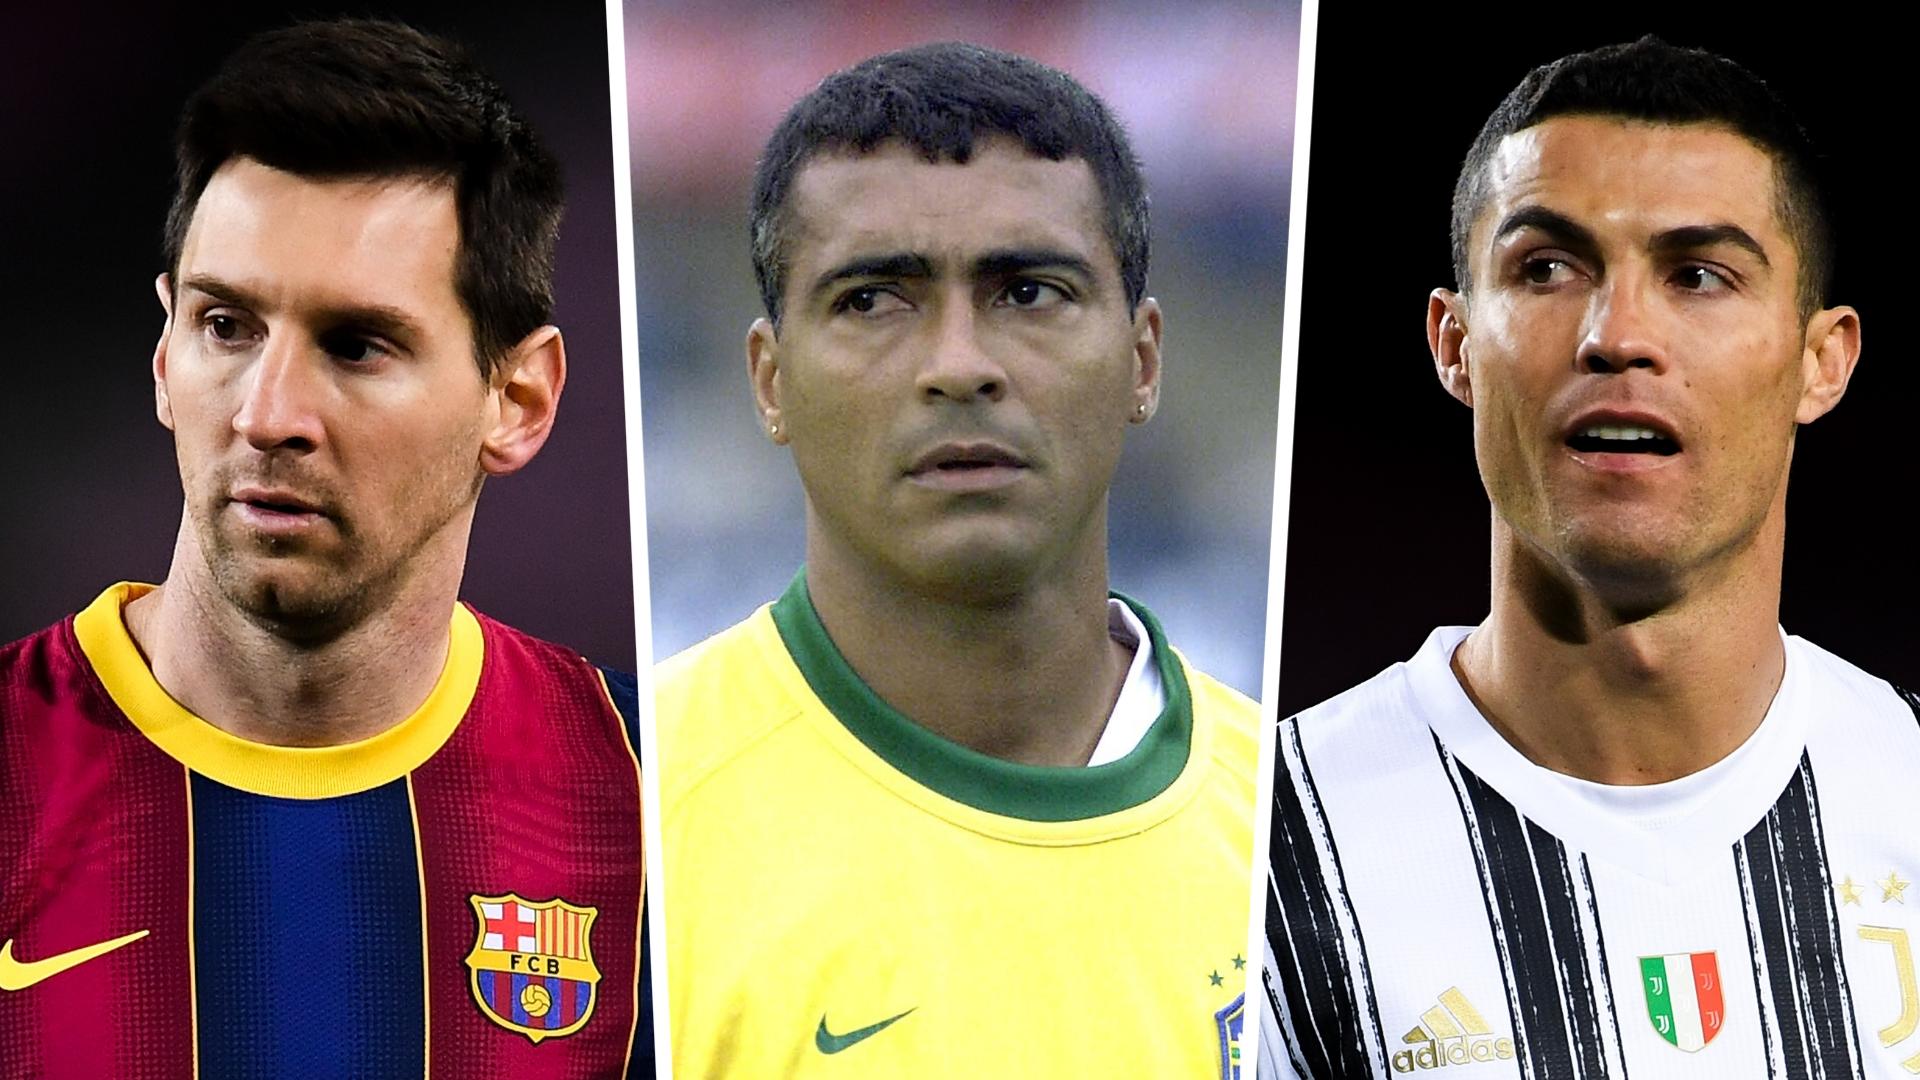 Ronaldo, Messi, Romario - who are the top goalscorers in football history?